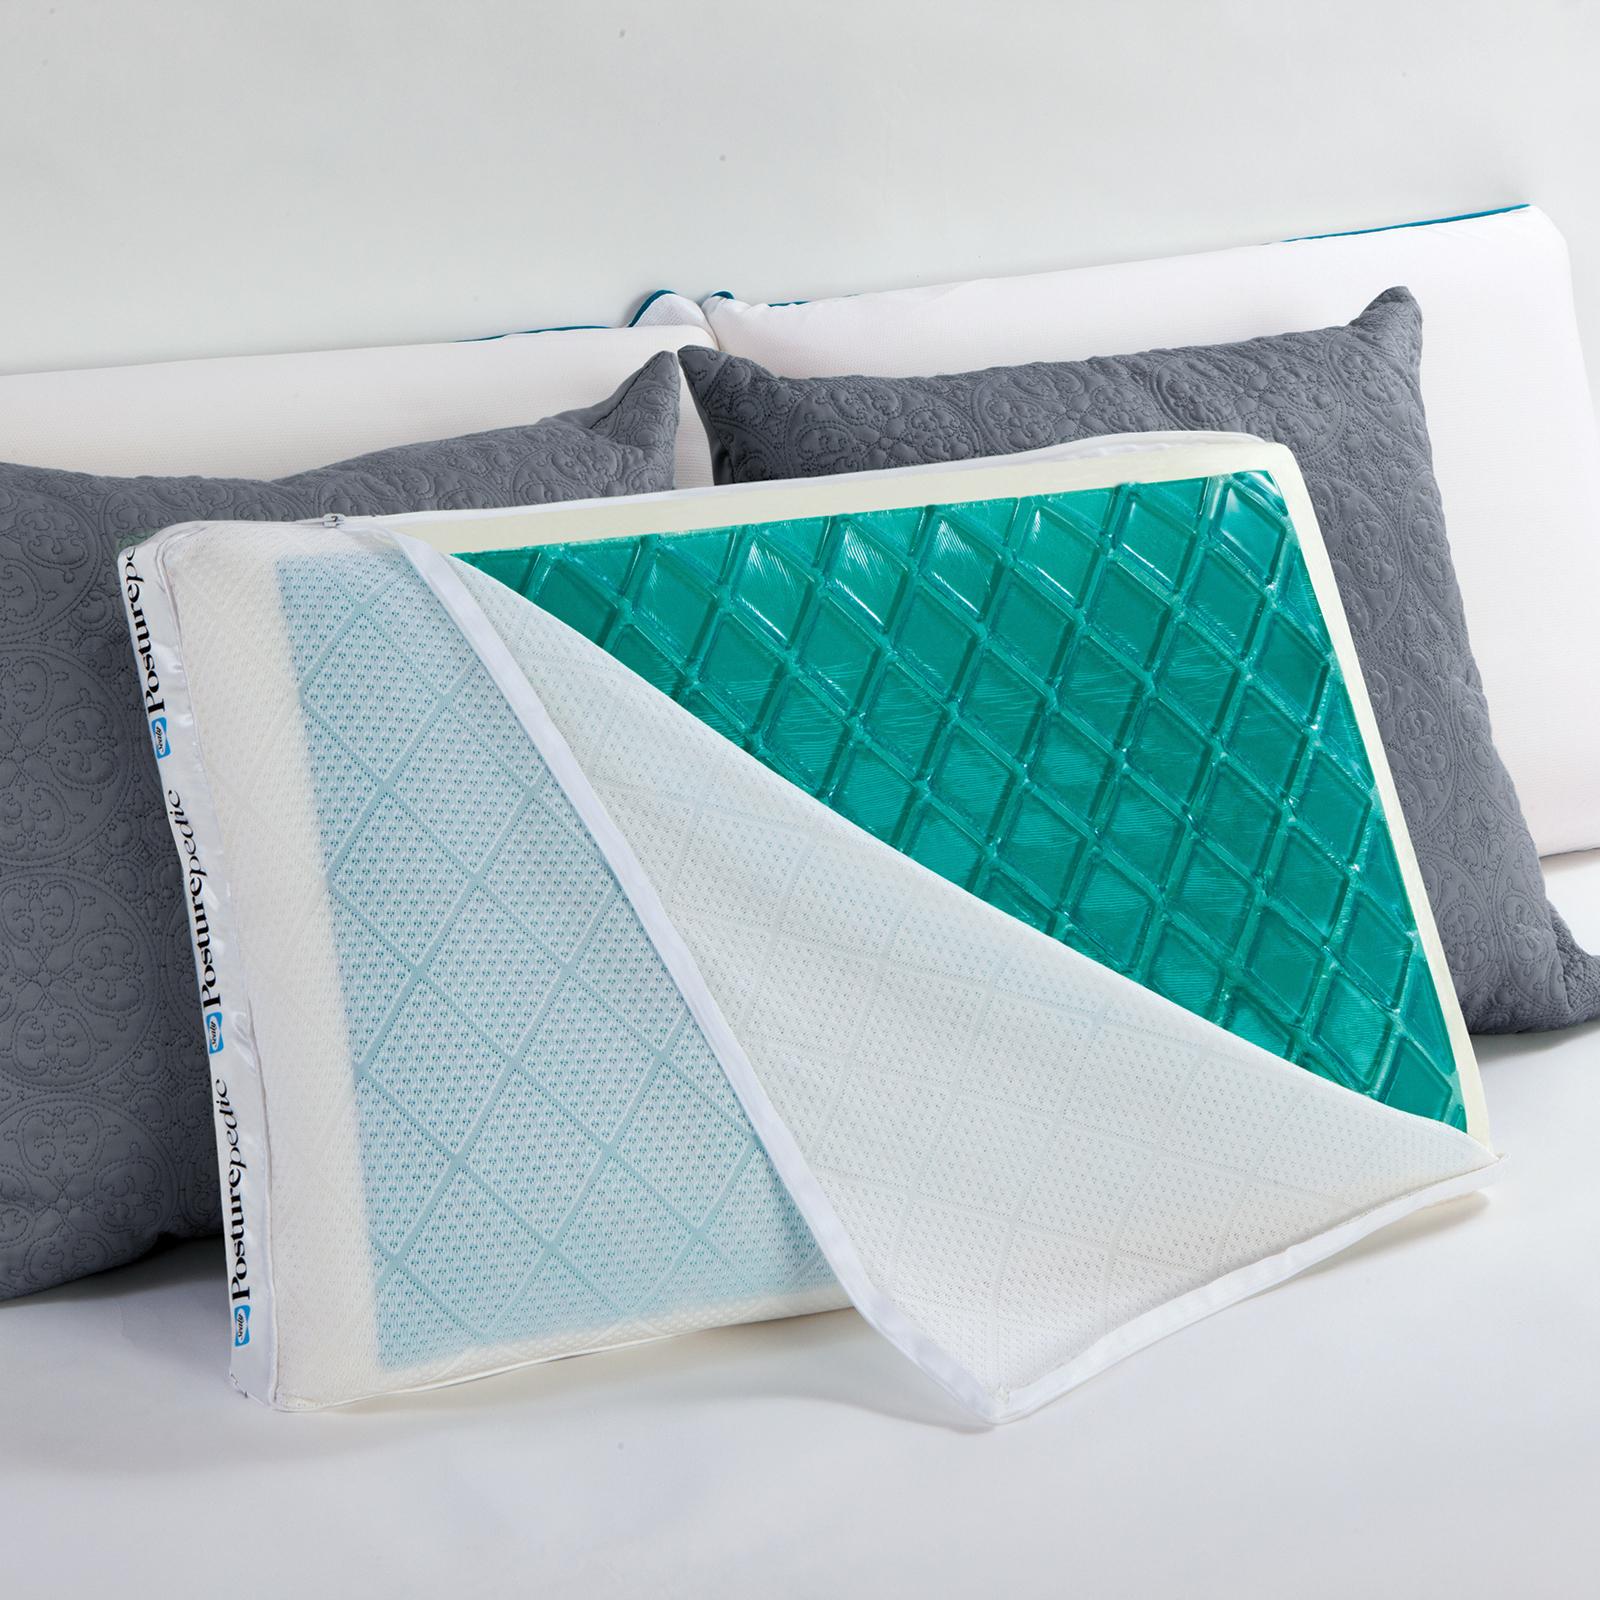 Sealy Posturepedic Hybrid Gel Pillow  Home  Bed  Bath